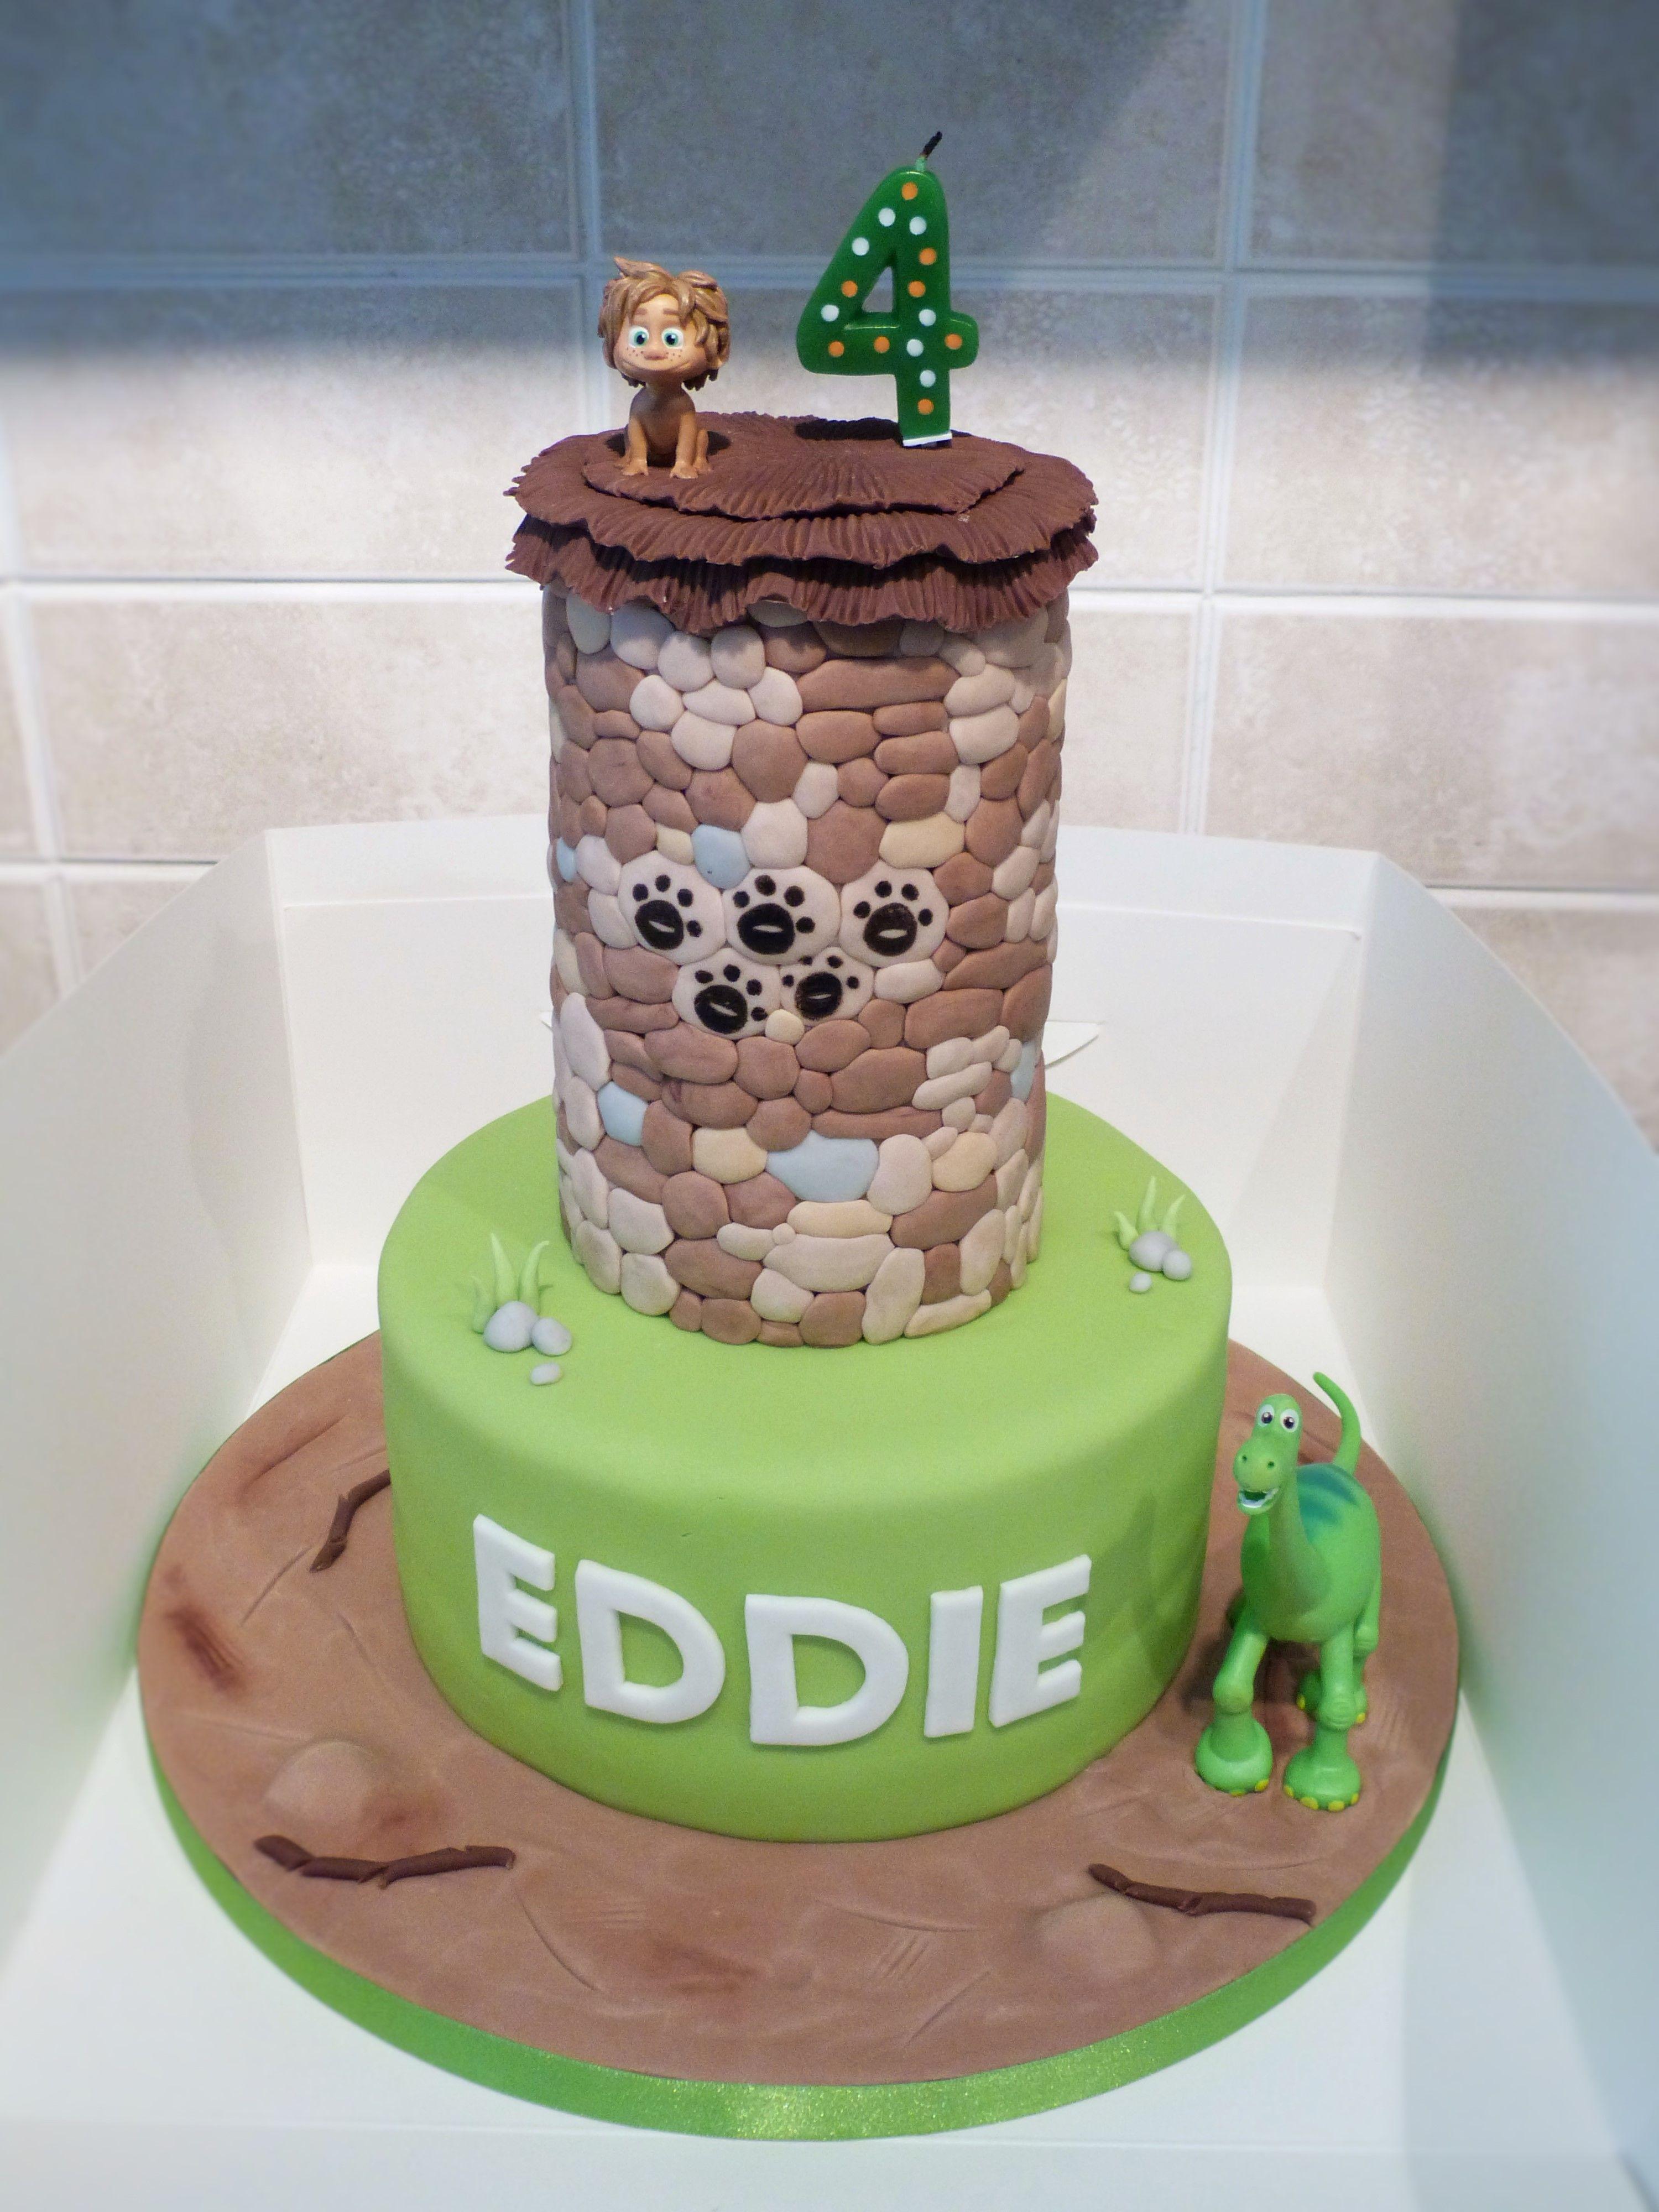 Good Dinosaur Cake Decorations : The Good Dinosaur cake PARTY - DINOSAURS (Tanner ...